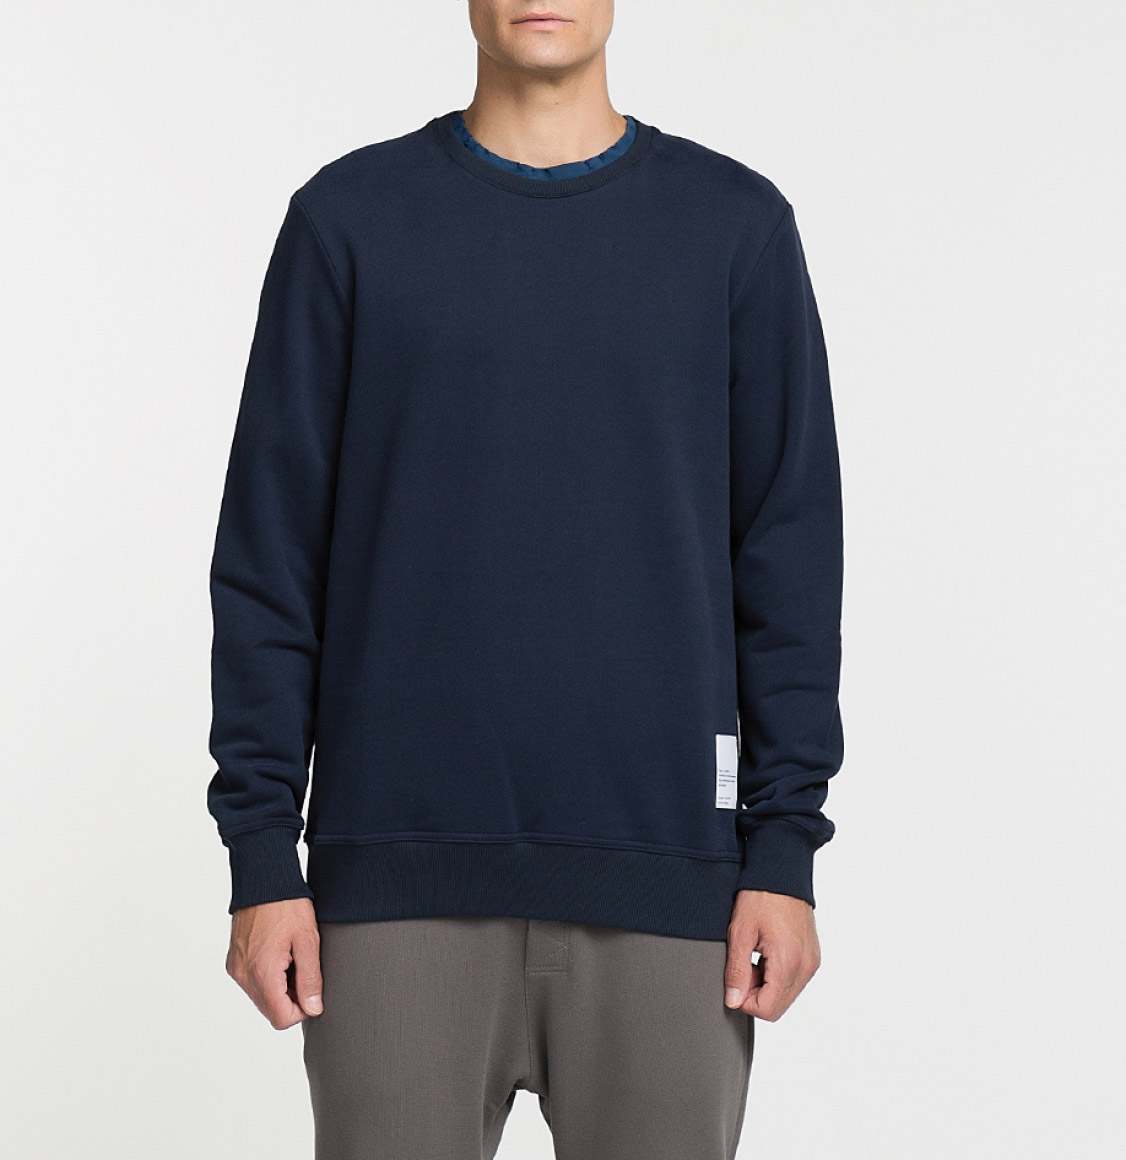 Logomania Crew Neck Sweatshirt Navy Blue